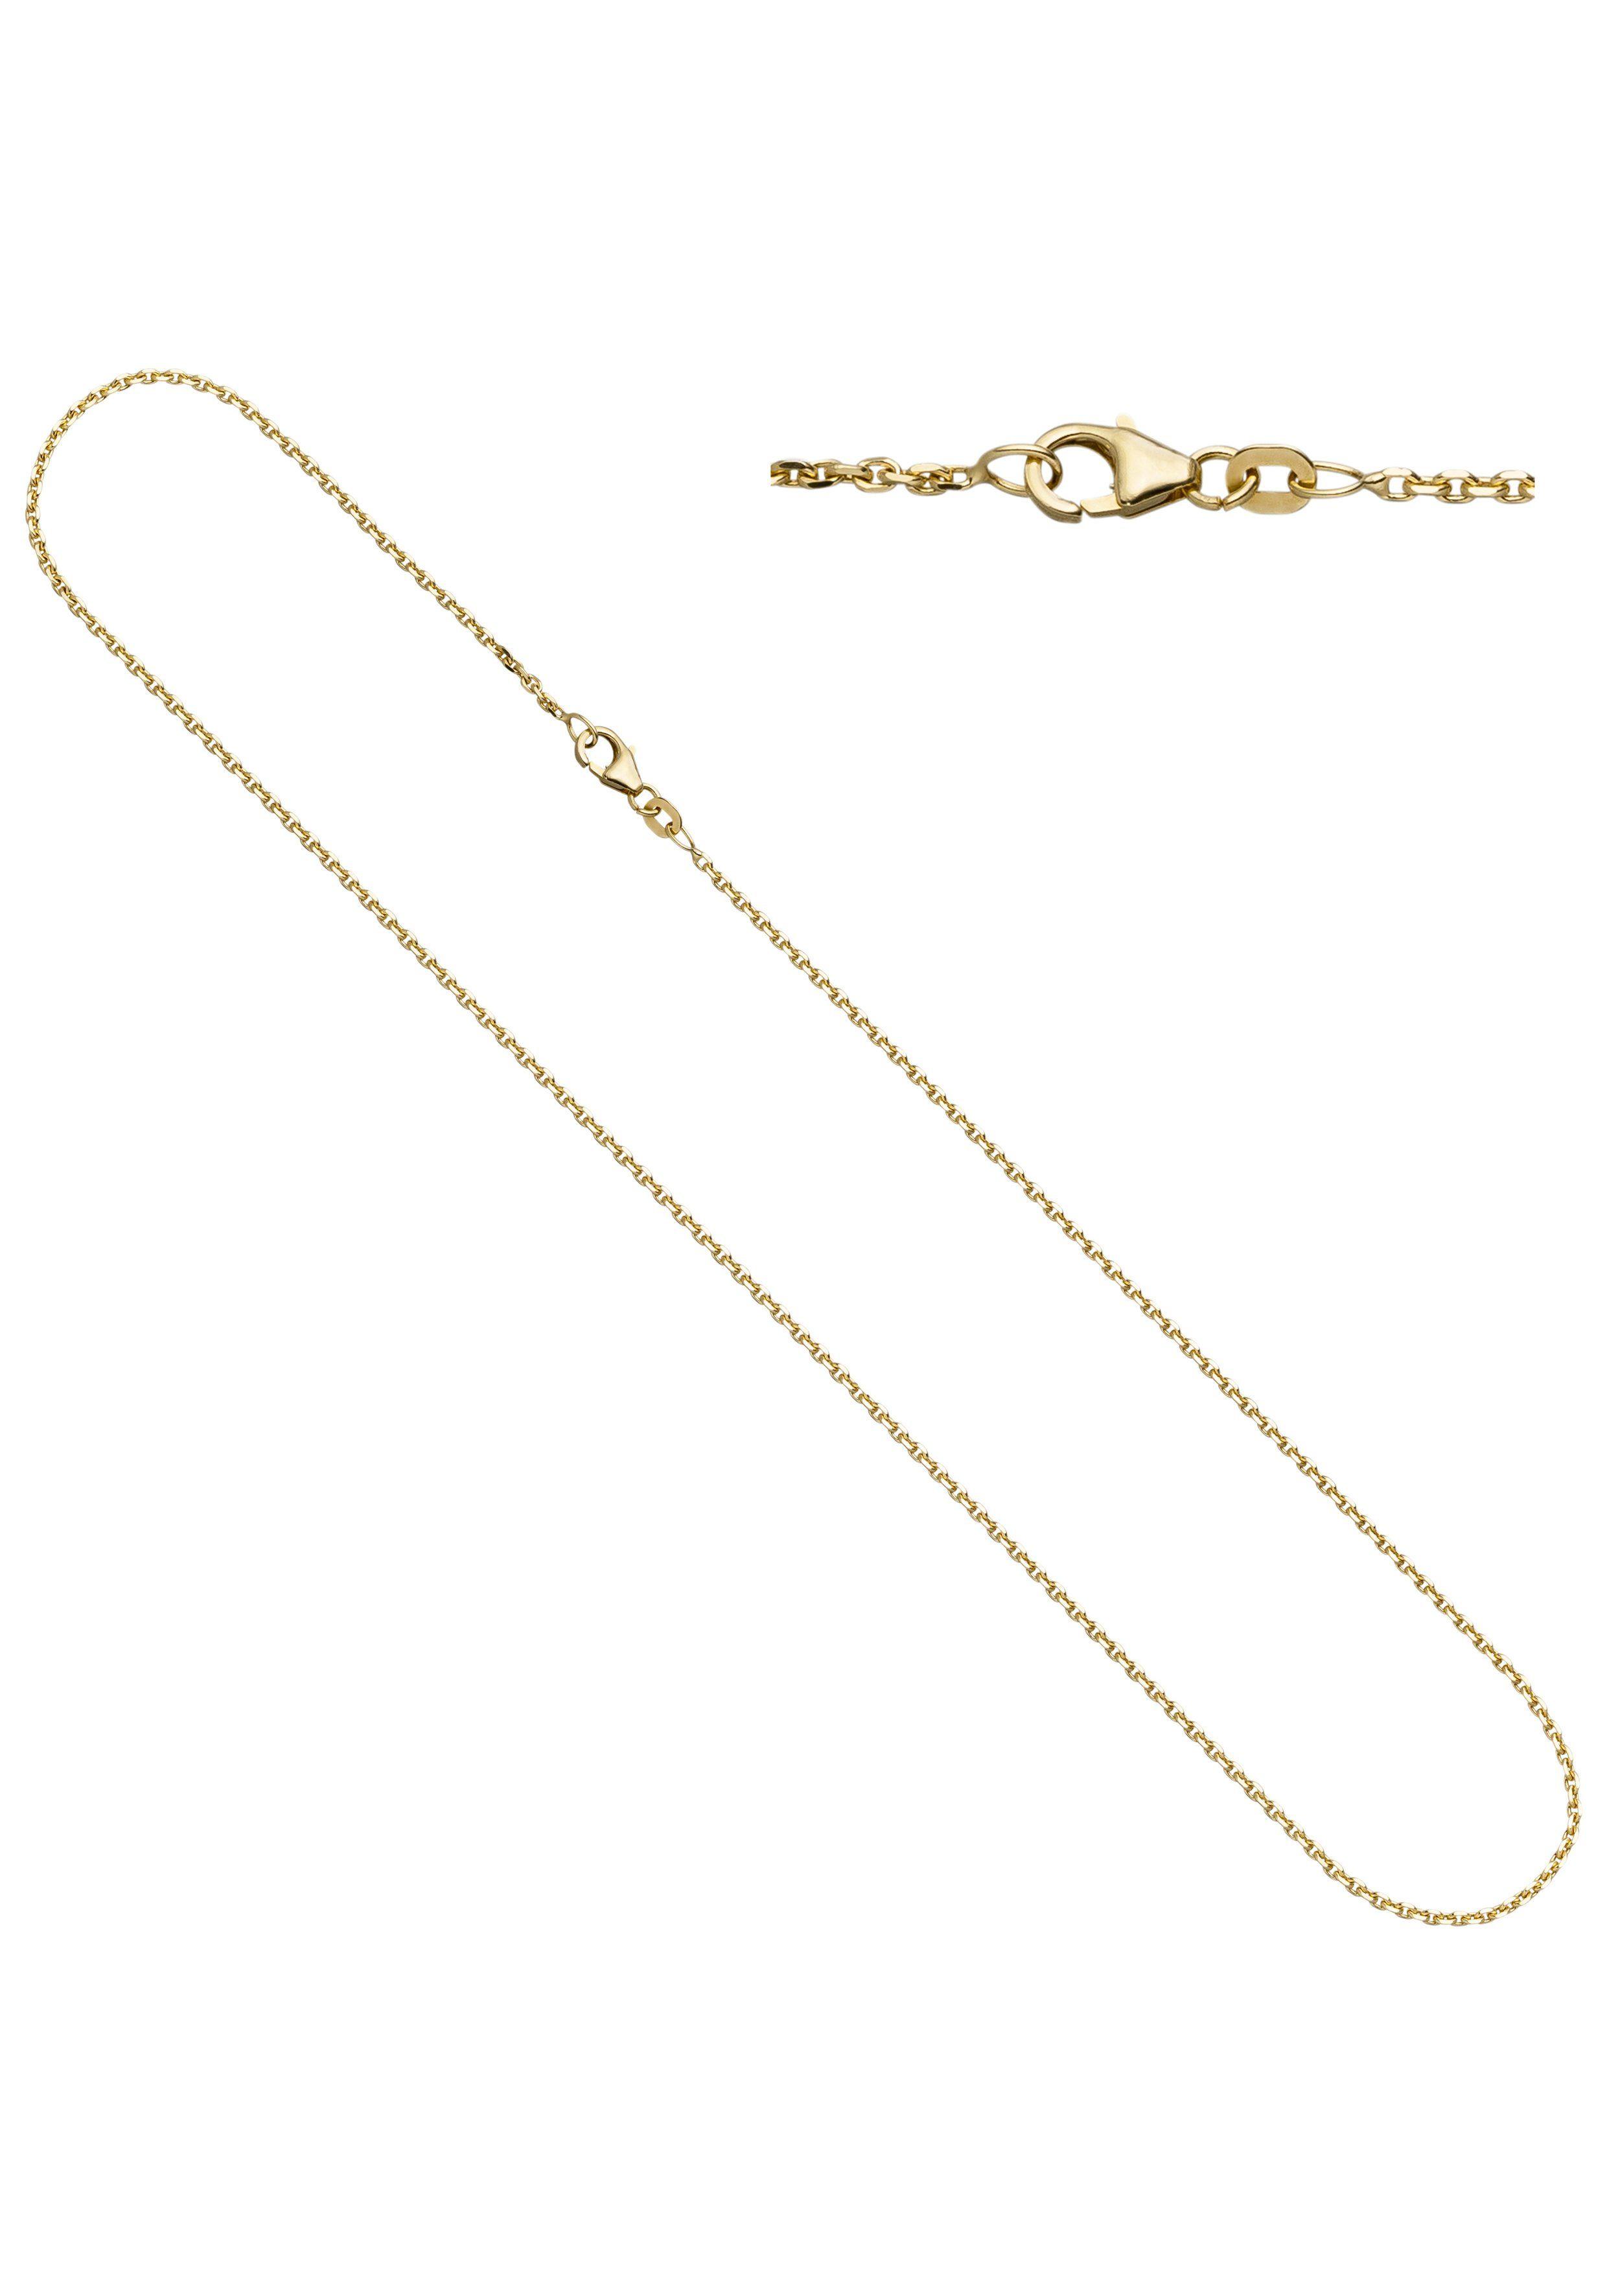 JOBO Goldkette Ankerkette 333 Gold diamantiert 42 cm 1,2 mm